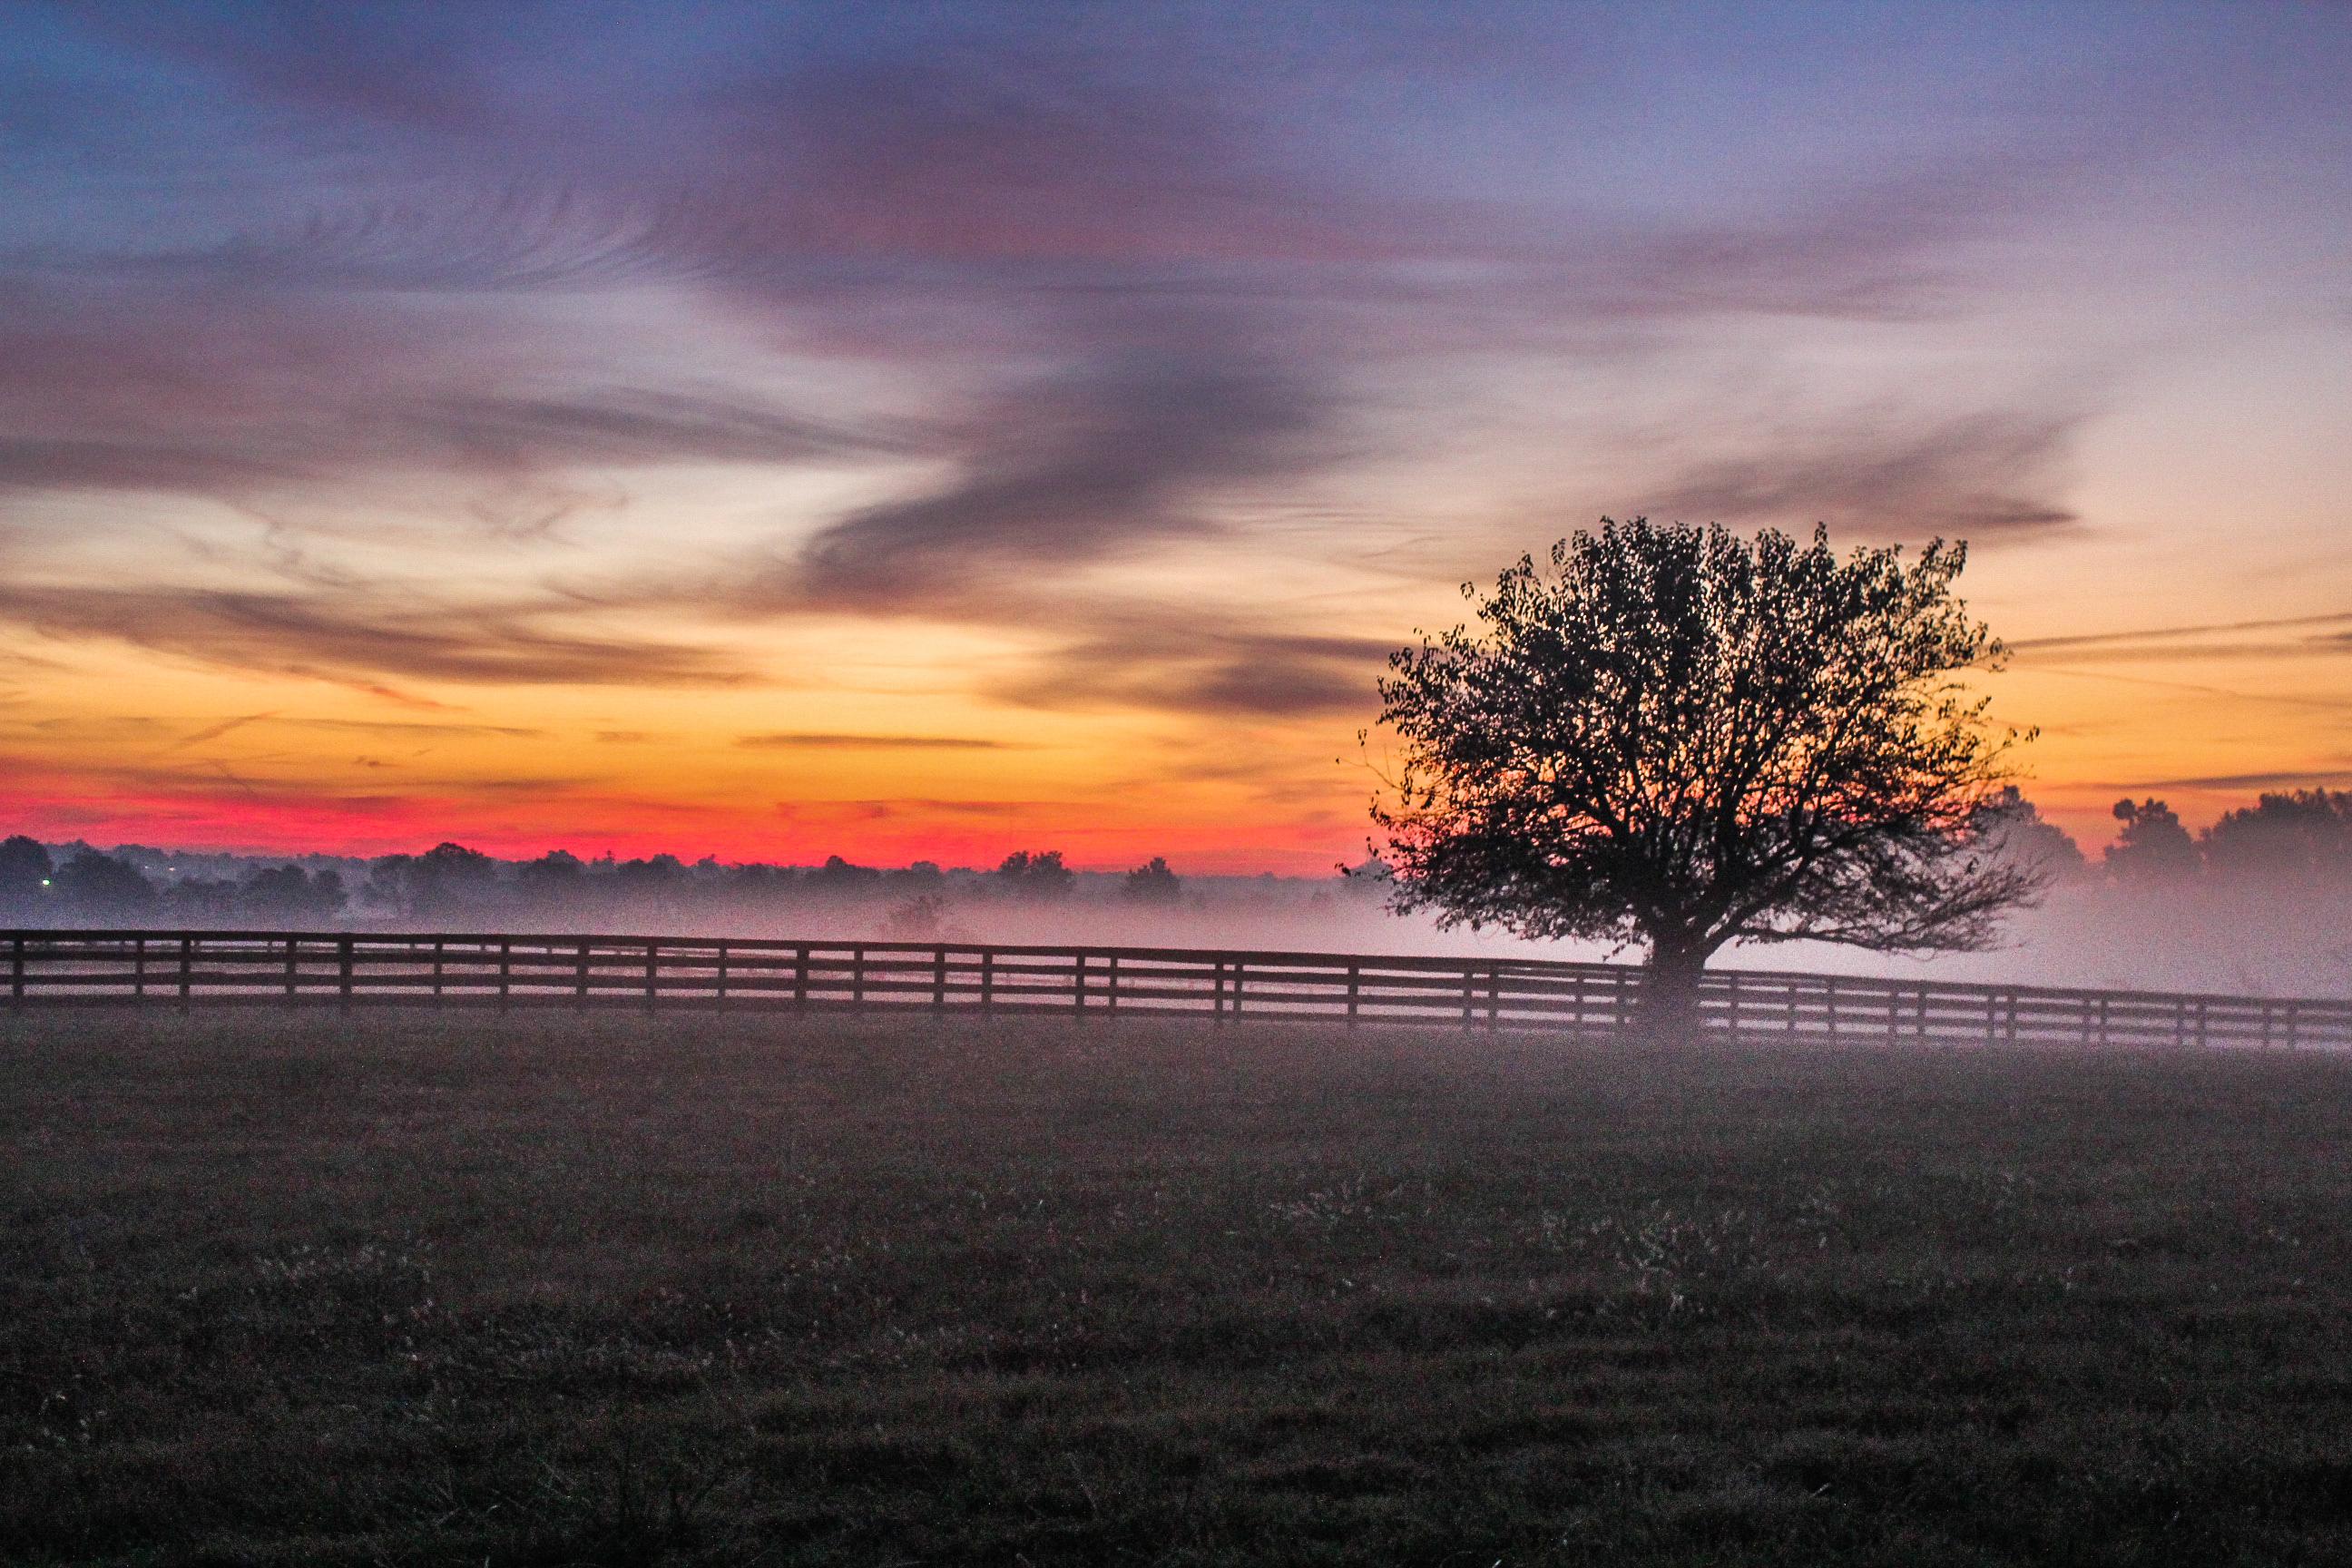 free images : sea, coast, tree, horizon, fence, cloud, sun, fog